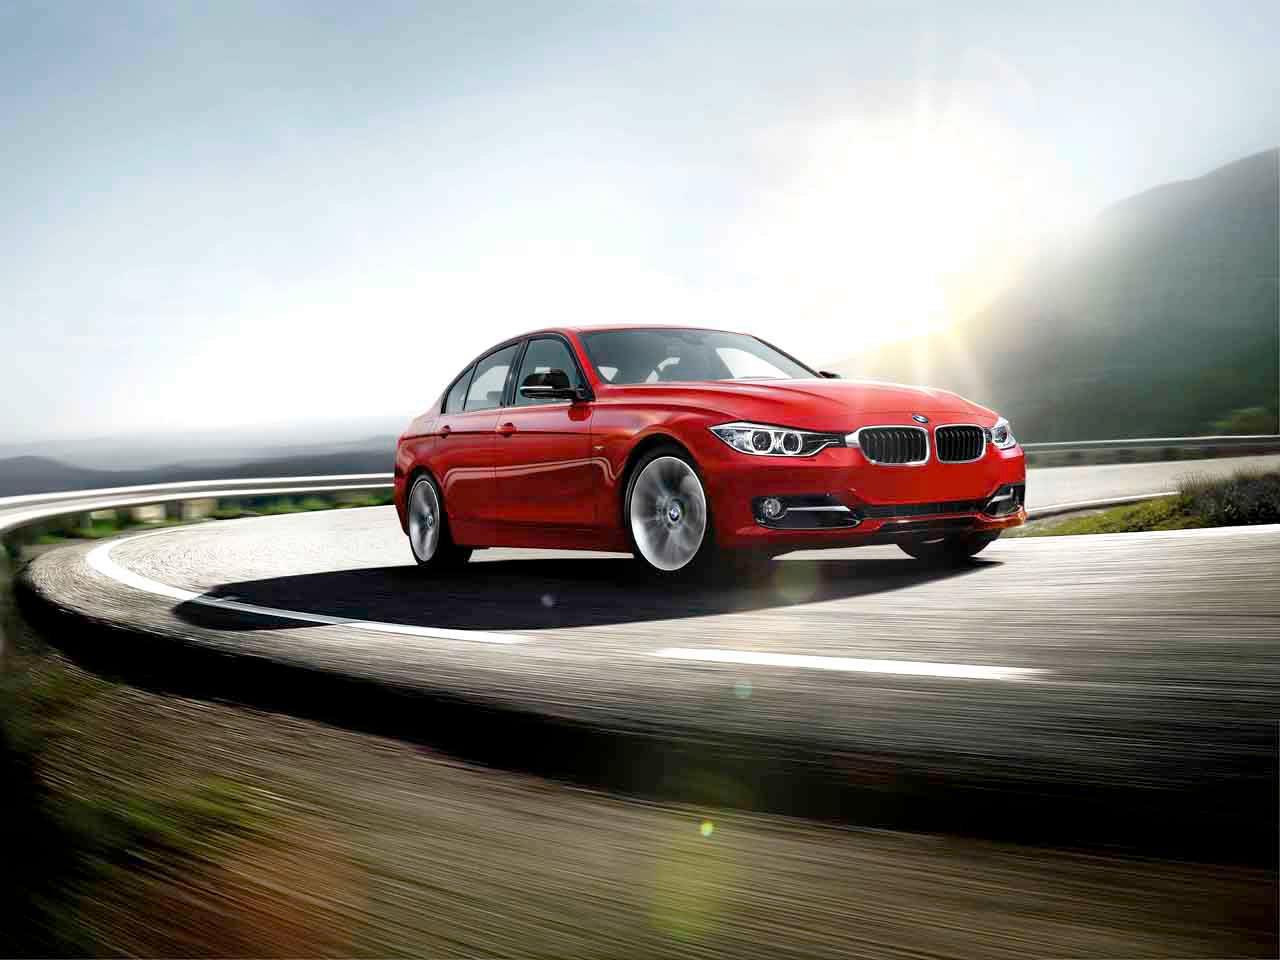 2012 Bmw 3 Series Bigger Bolder And More Fuel Efficient